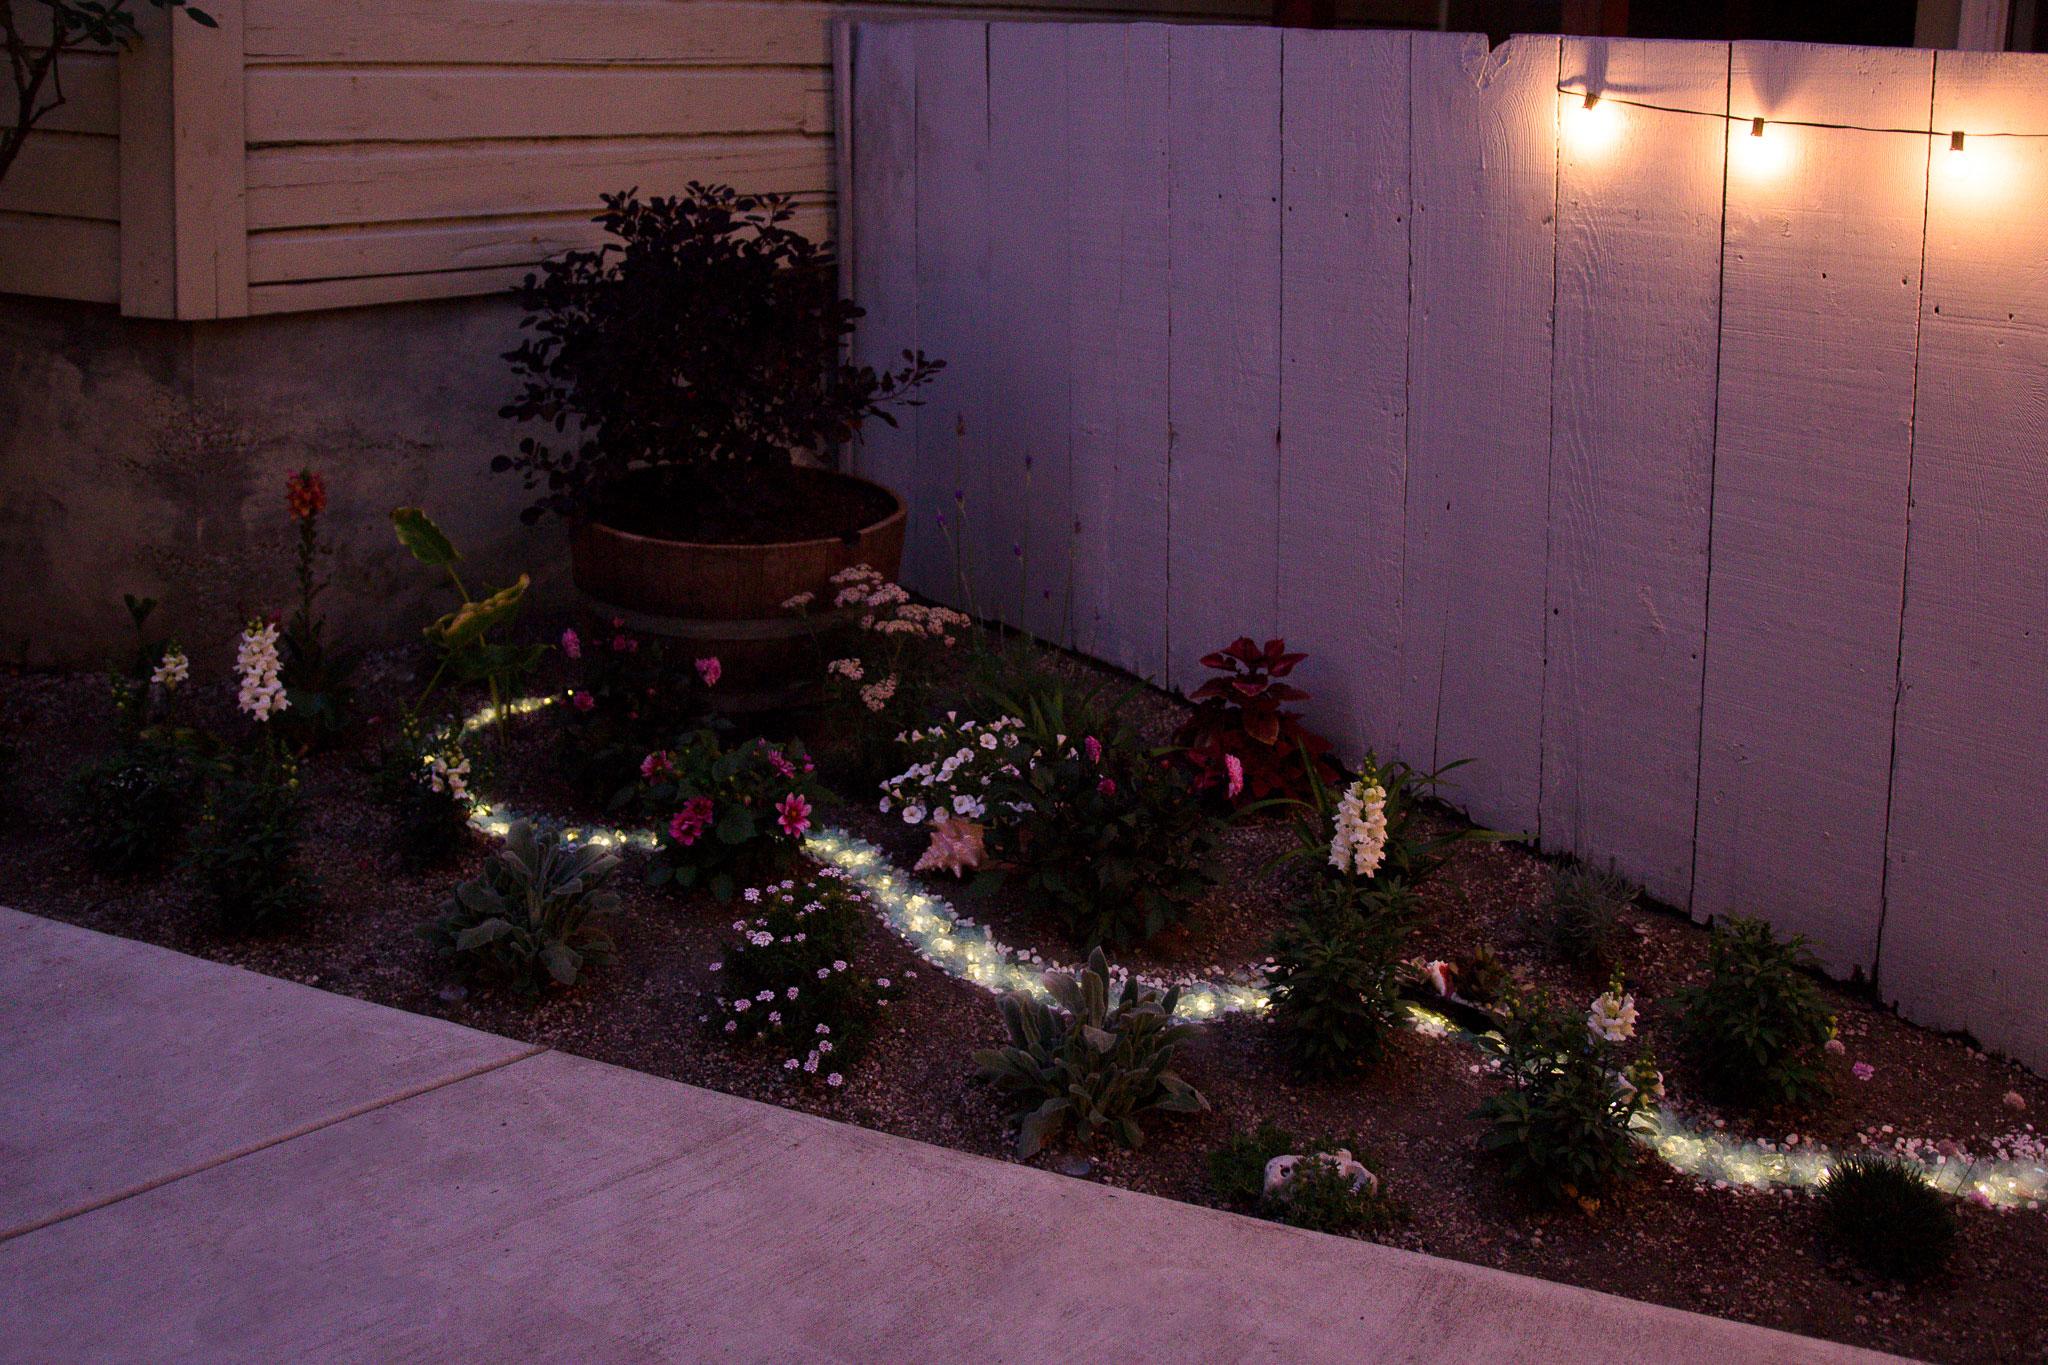 Adelya_Tumasyeva_the-garden-project_34.jpg